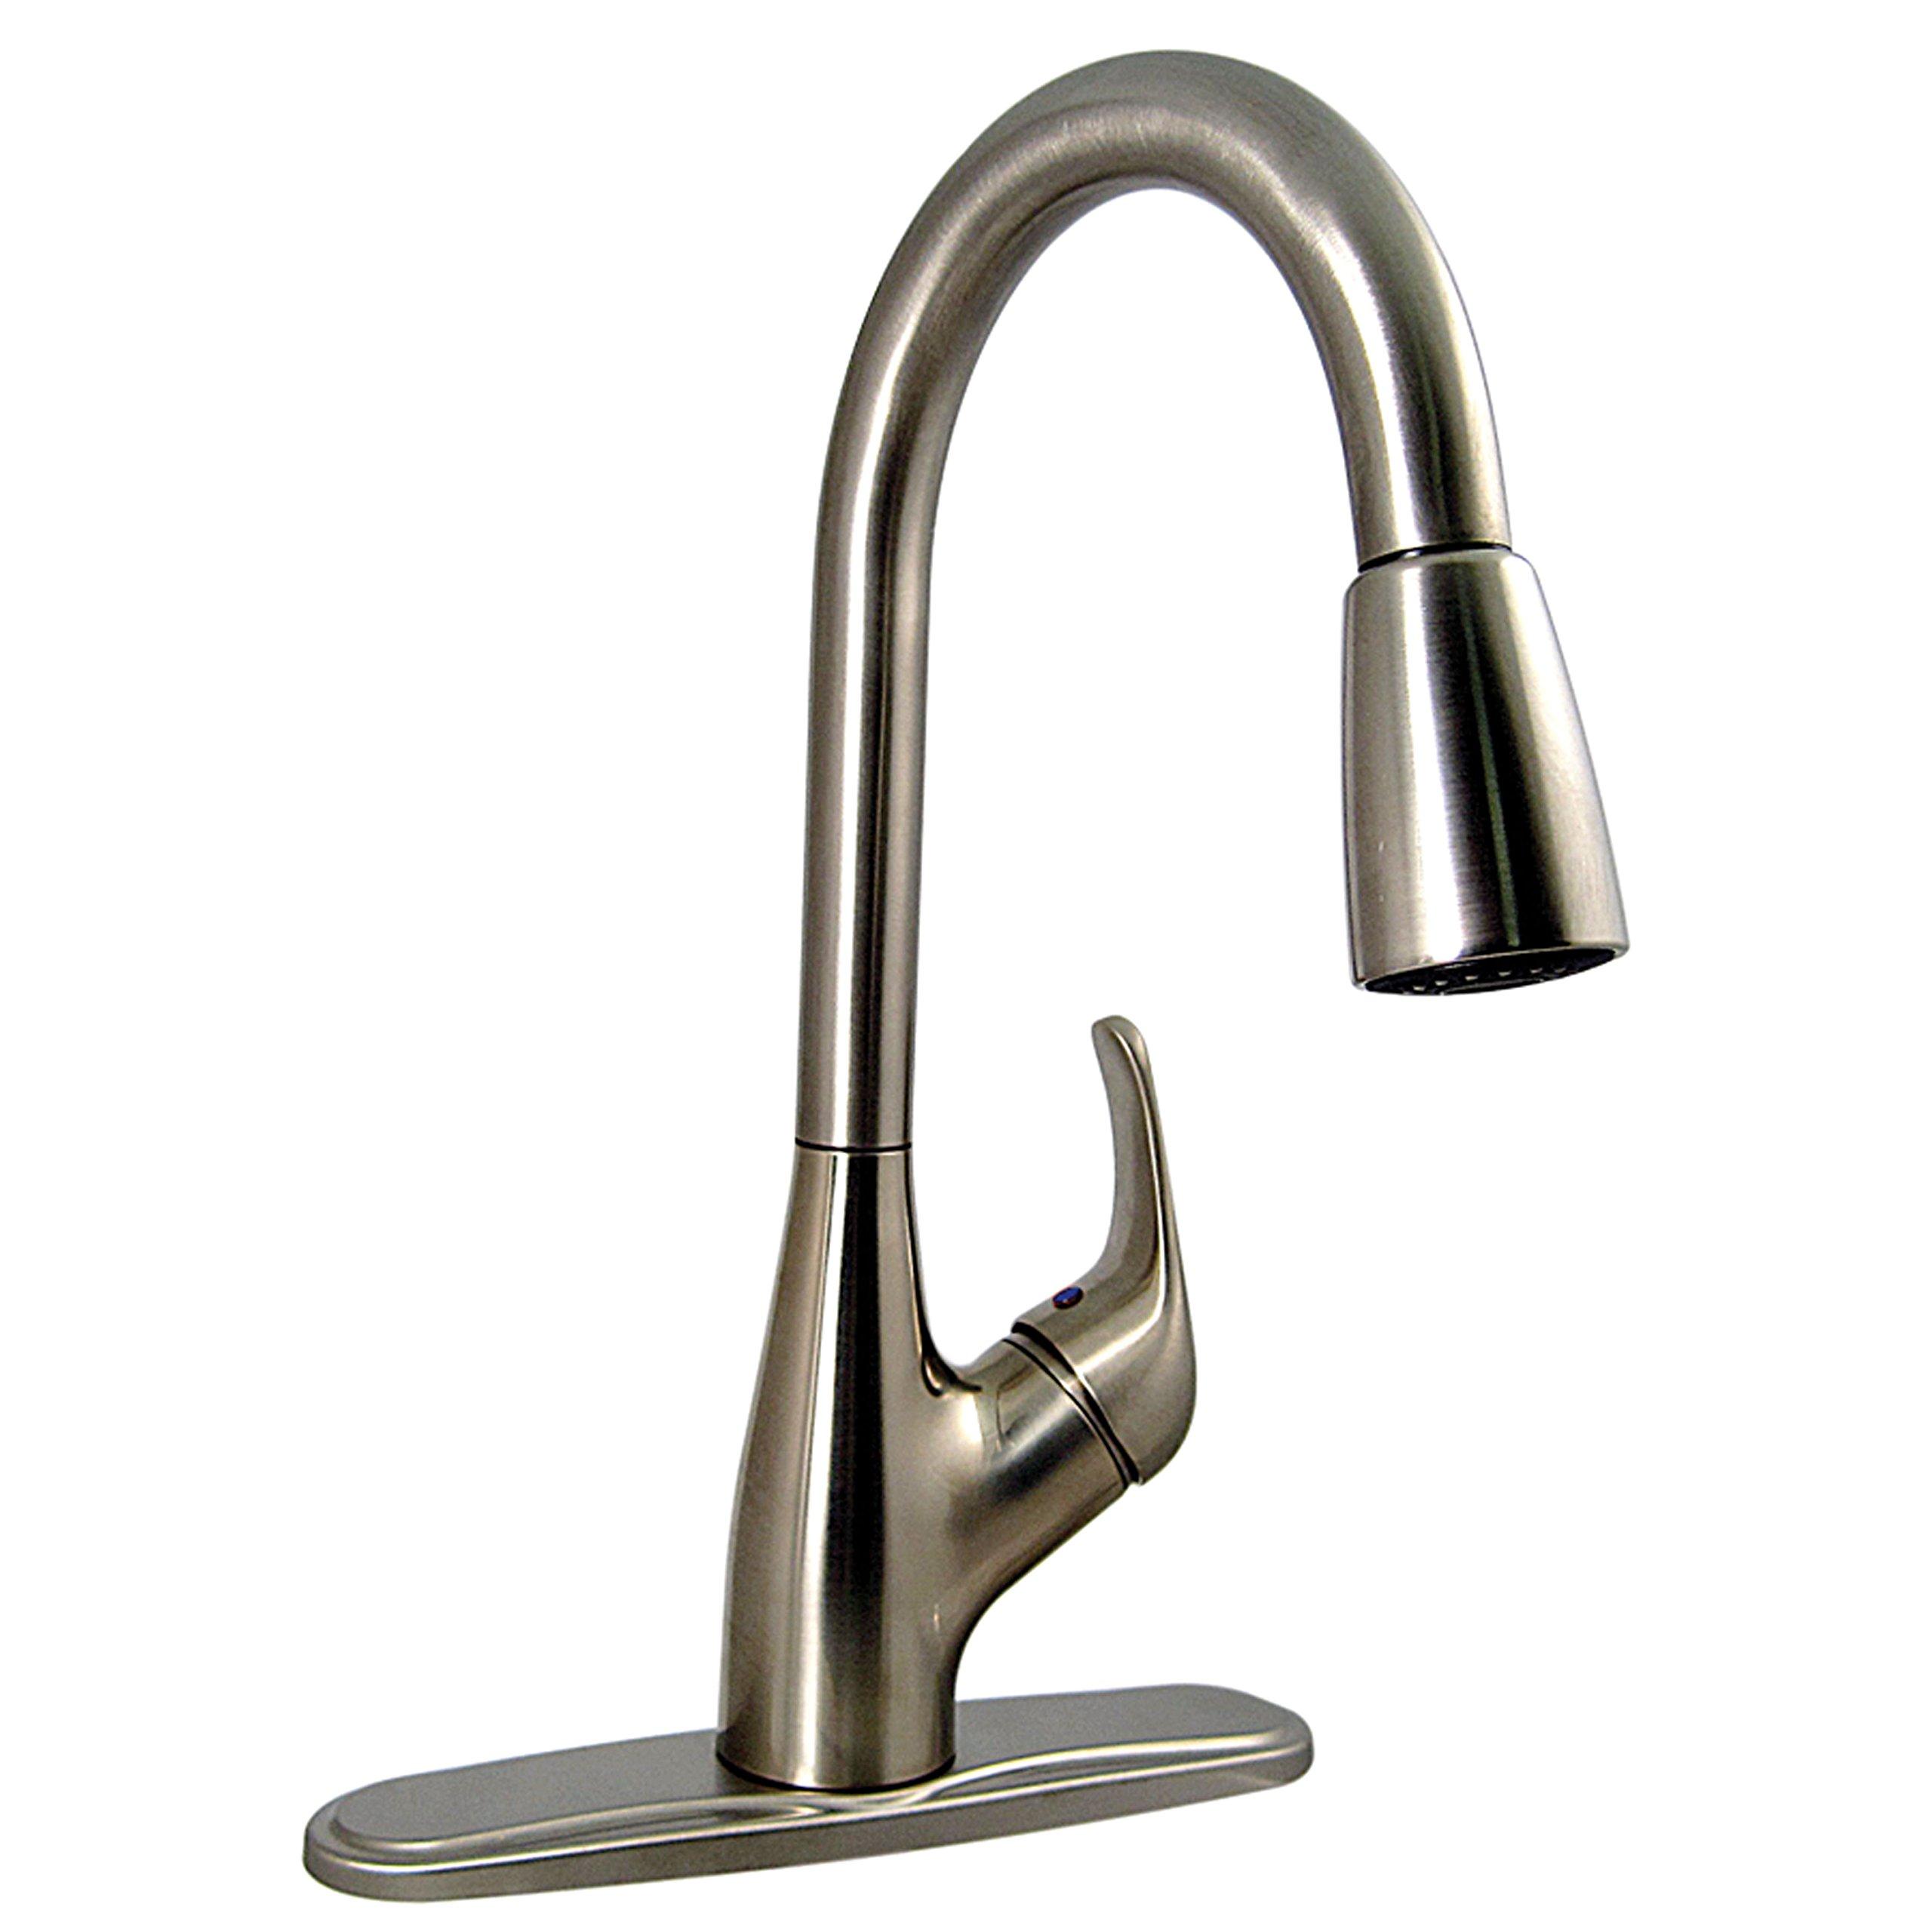 Phoenix Valterra PF231461 Single-Handle Pull Down Hybrid Kitchen Faucet with Spray Shut-Off-Brushed Nickel